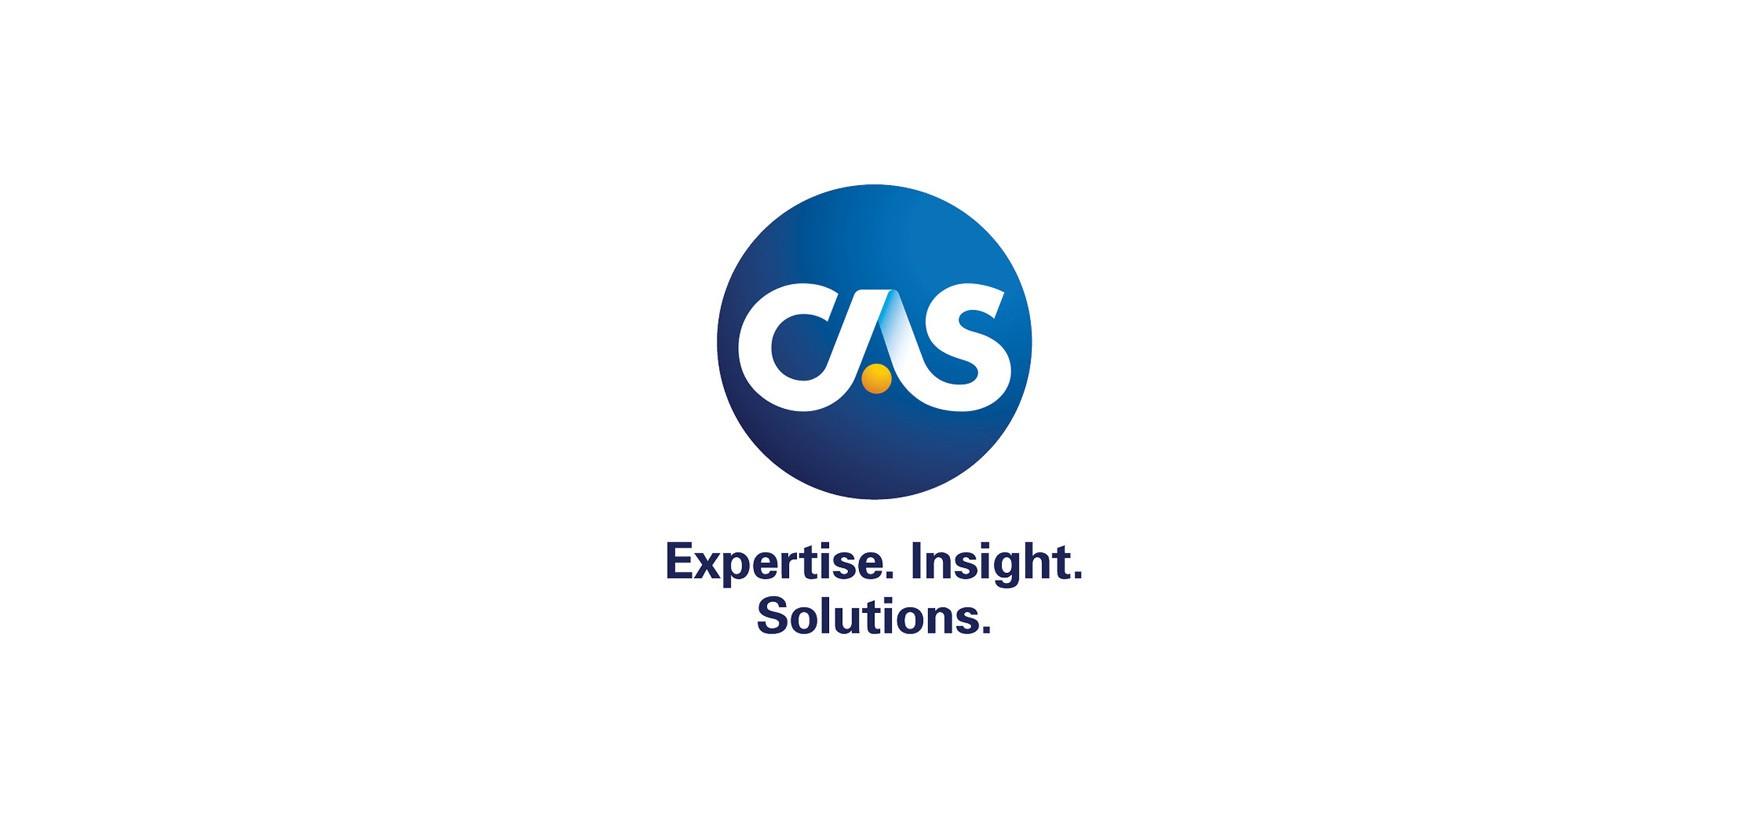 CAS, casualty actuarial society